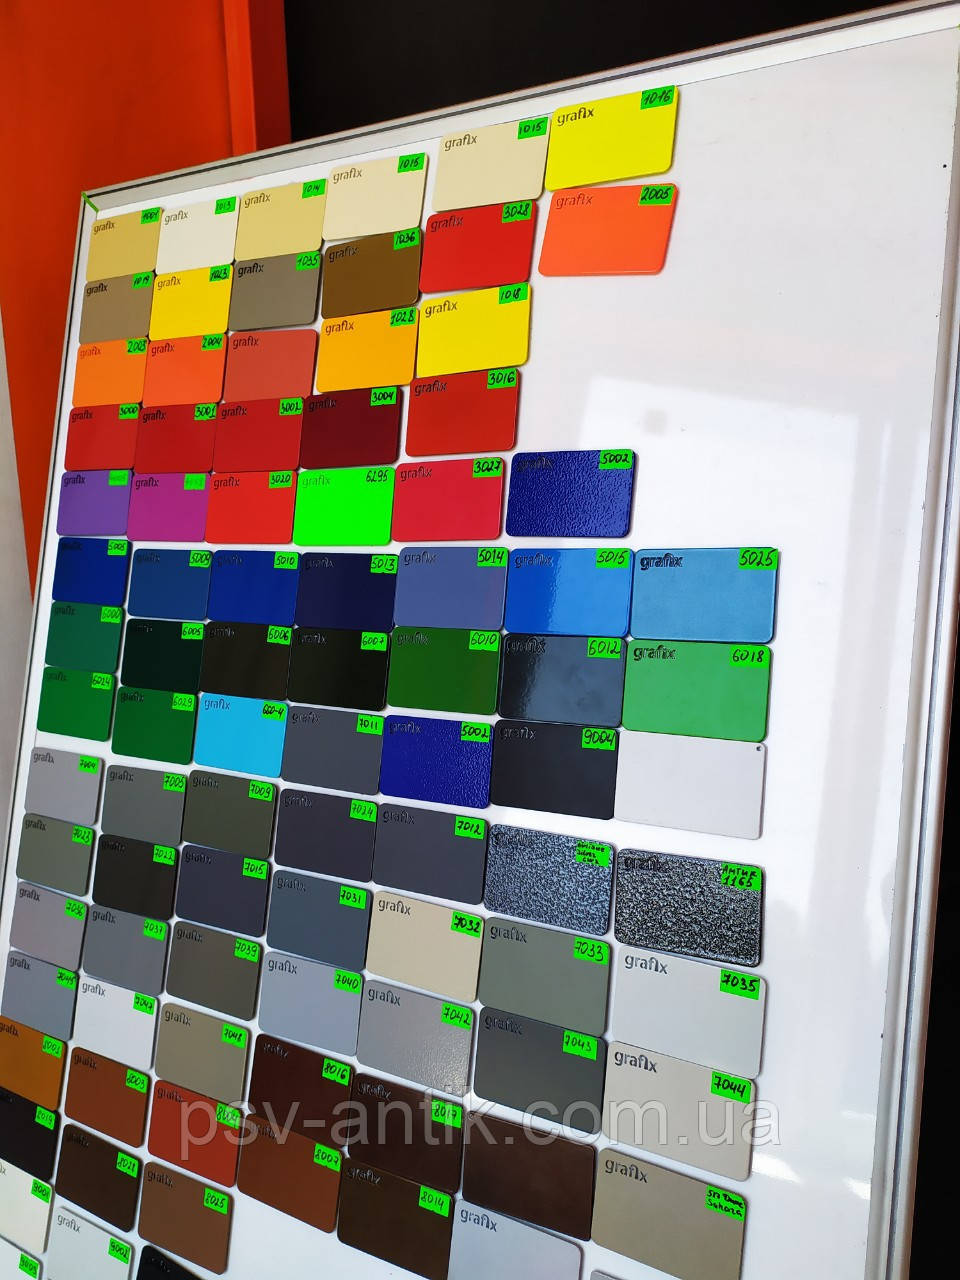 Порошковая краска глянцевая, полиэфирная, архитектурная, 6024